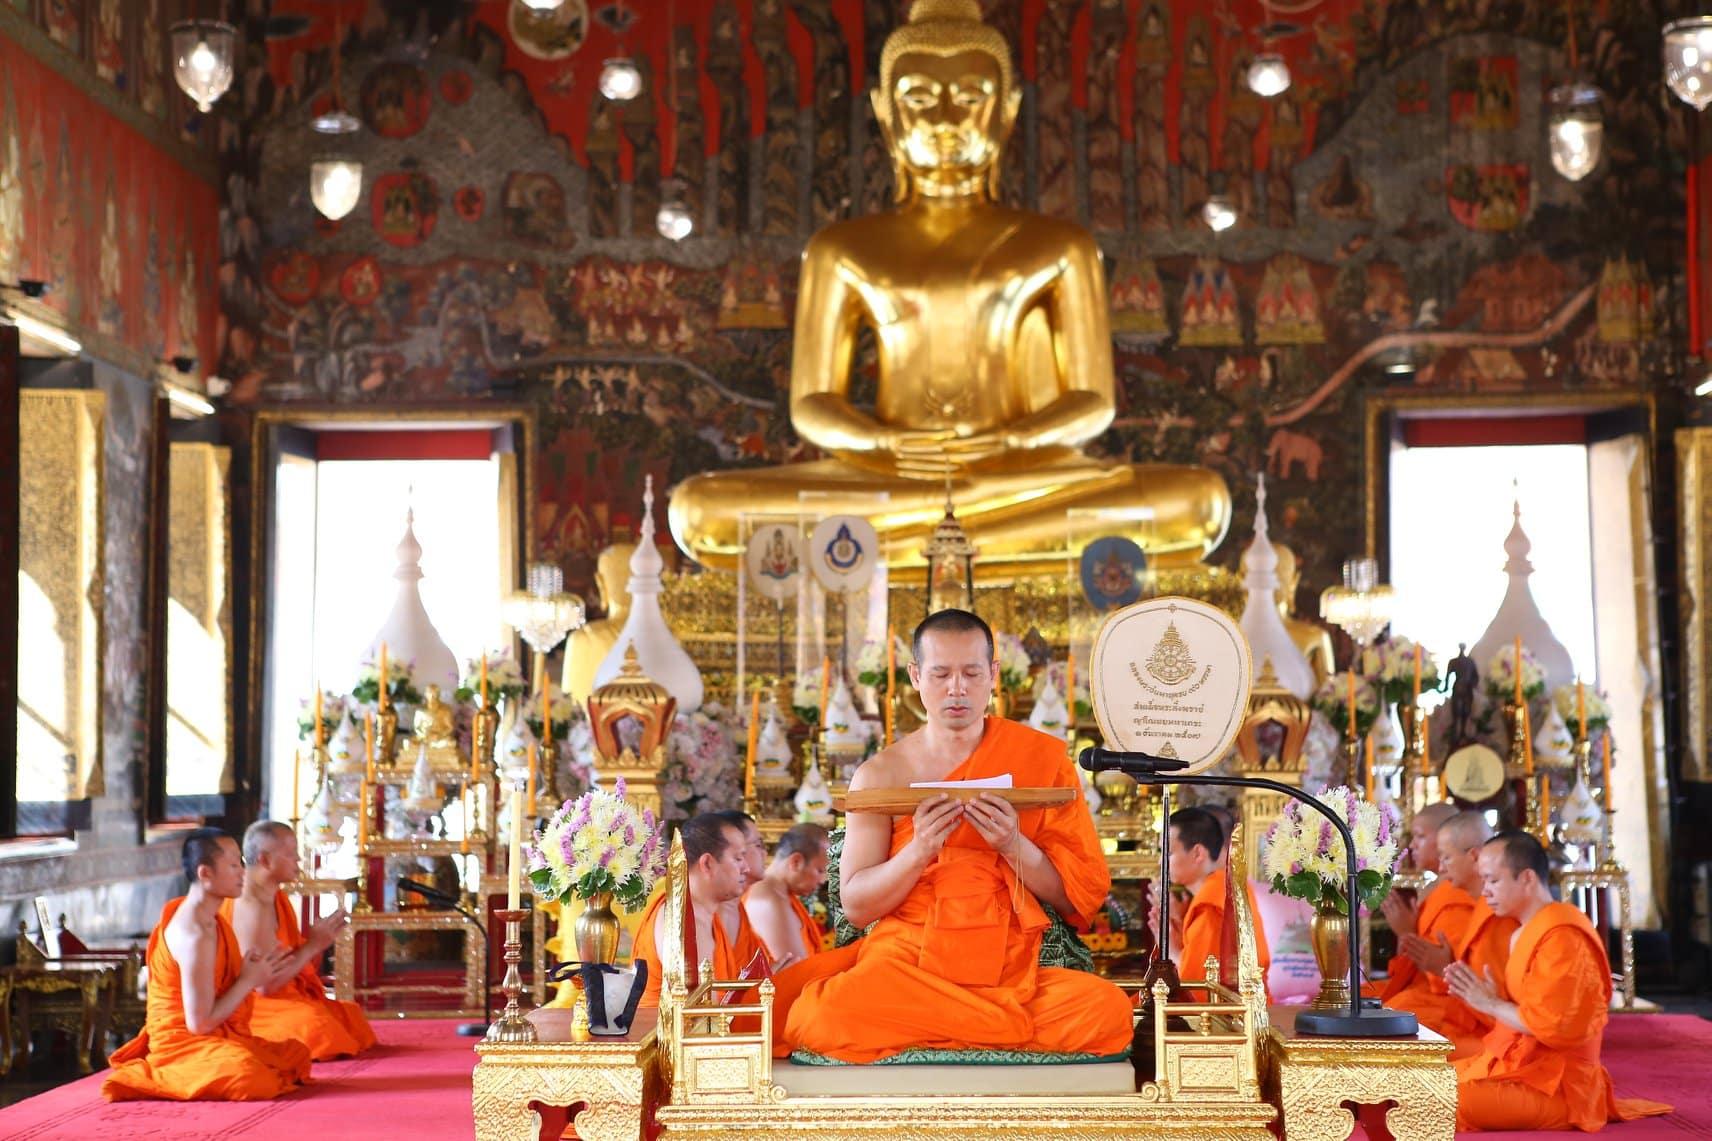 Visakha Bucha Day - กิจกรรมที่พึงปฏิบัติในวันวิสาขบูชา